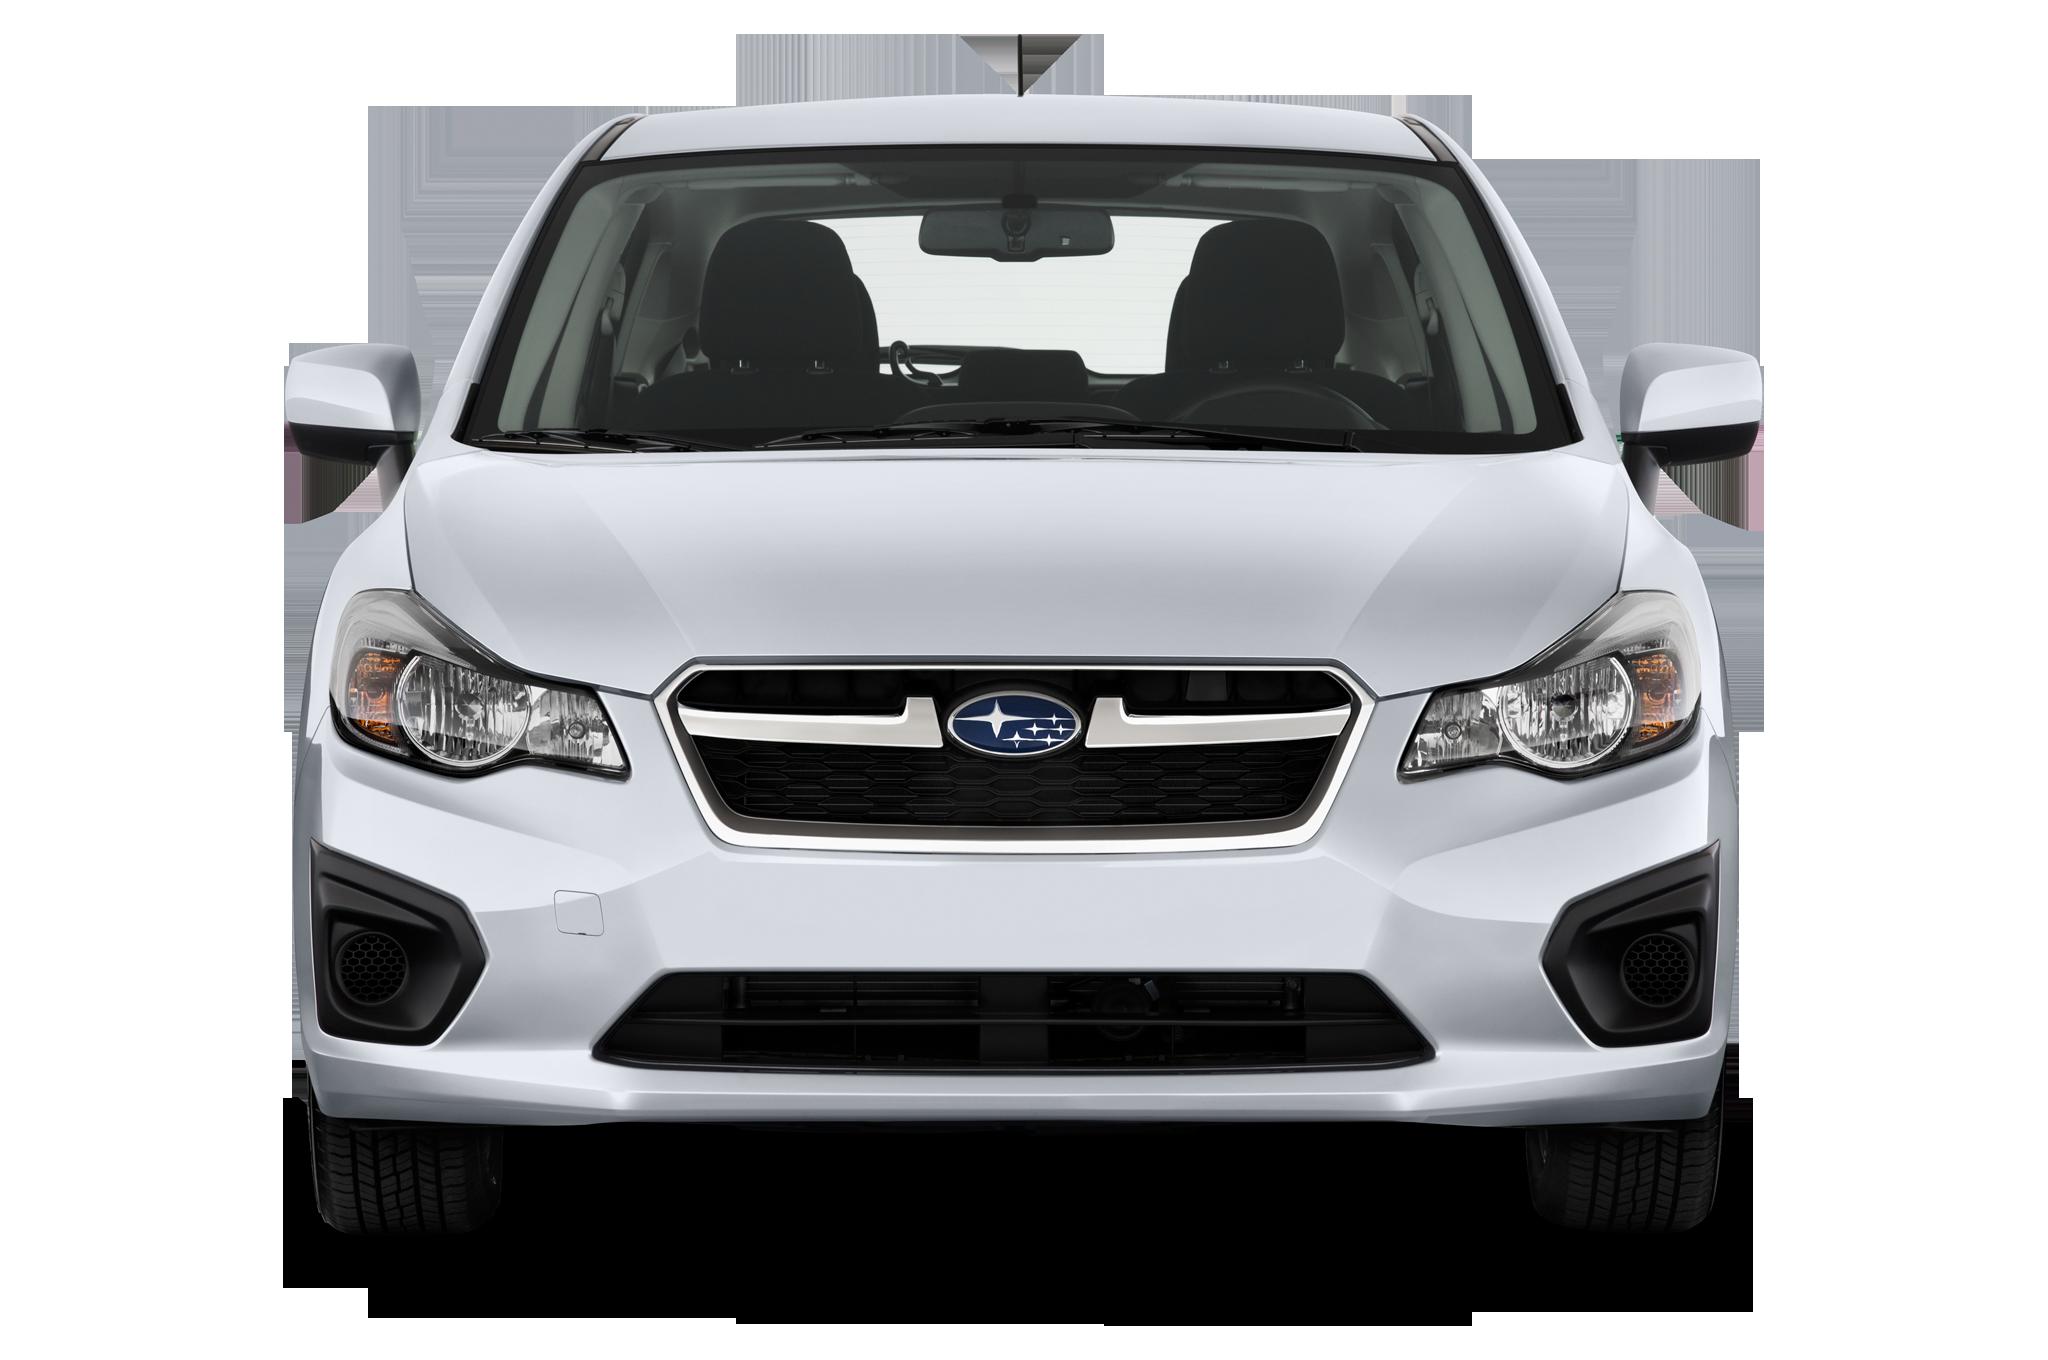 2012 Subaru Impreza Wrx Sti Editors Notebook Automobile Magazine Engine Diagram 17 80